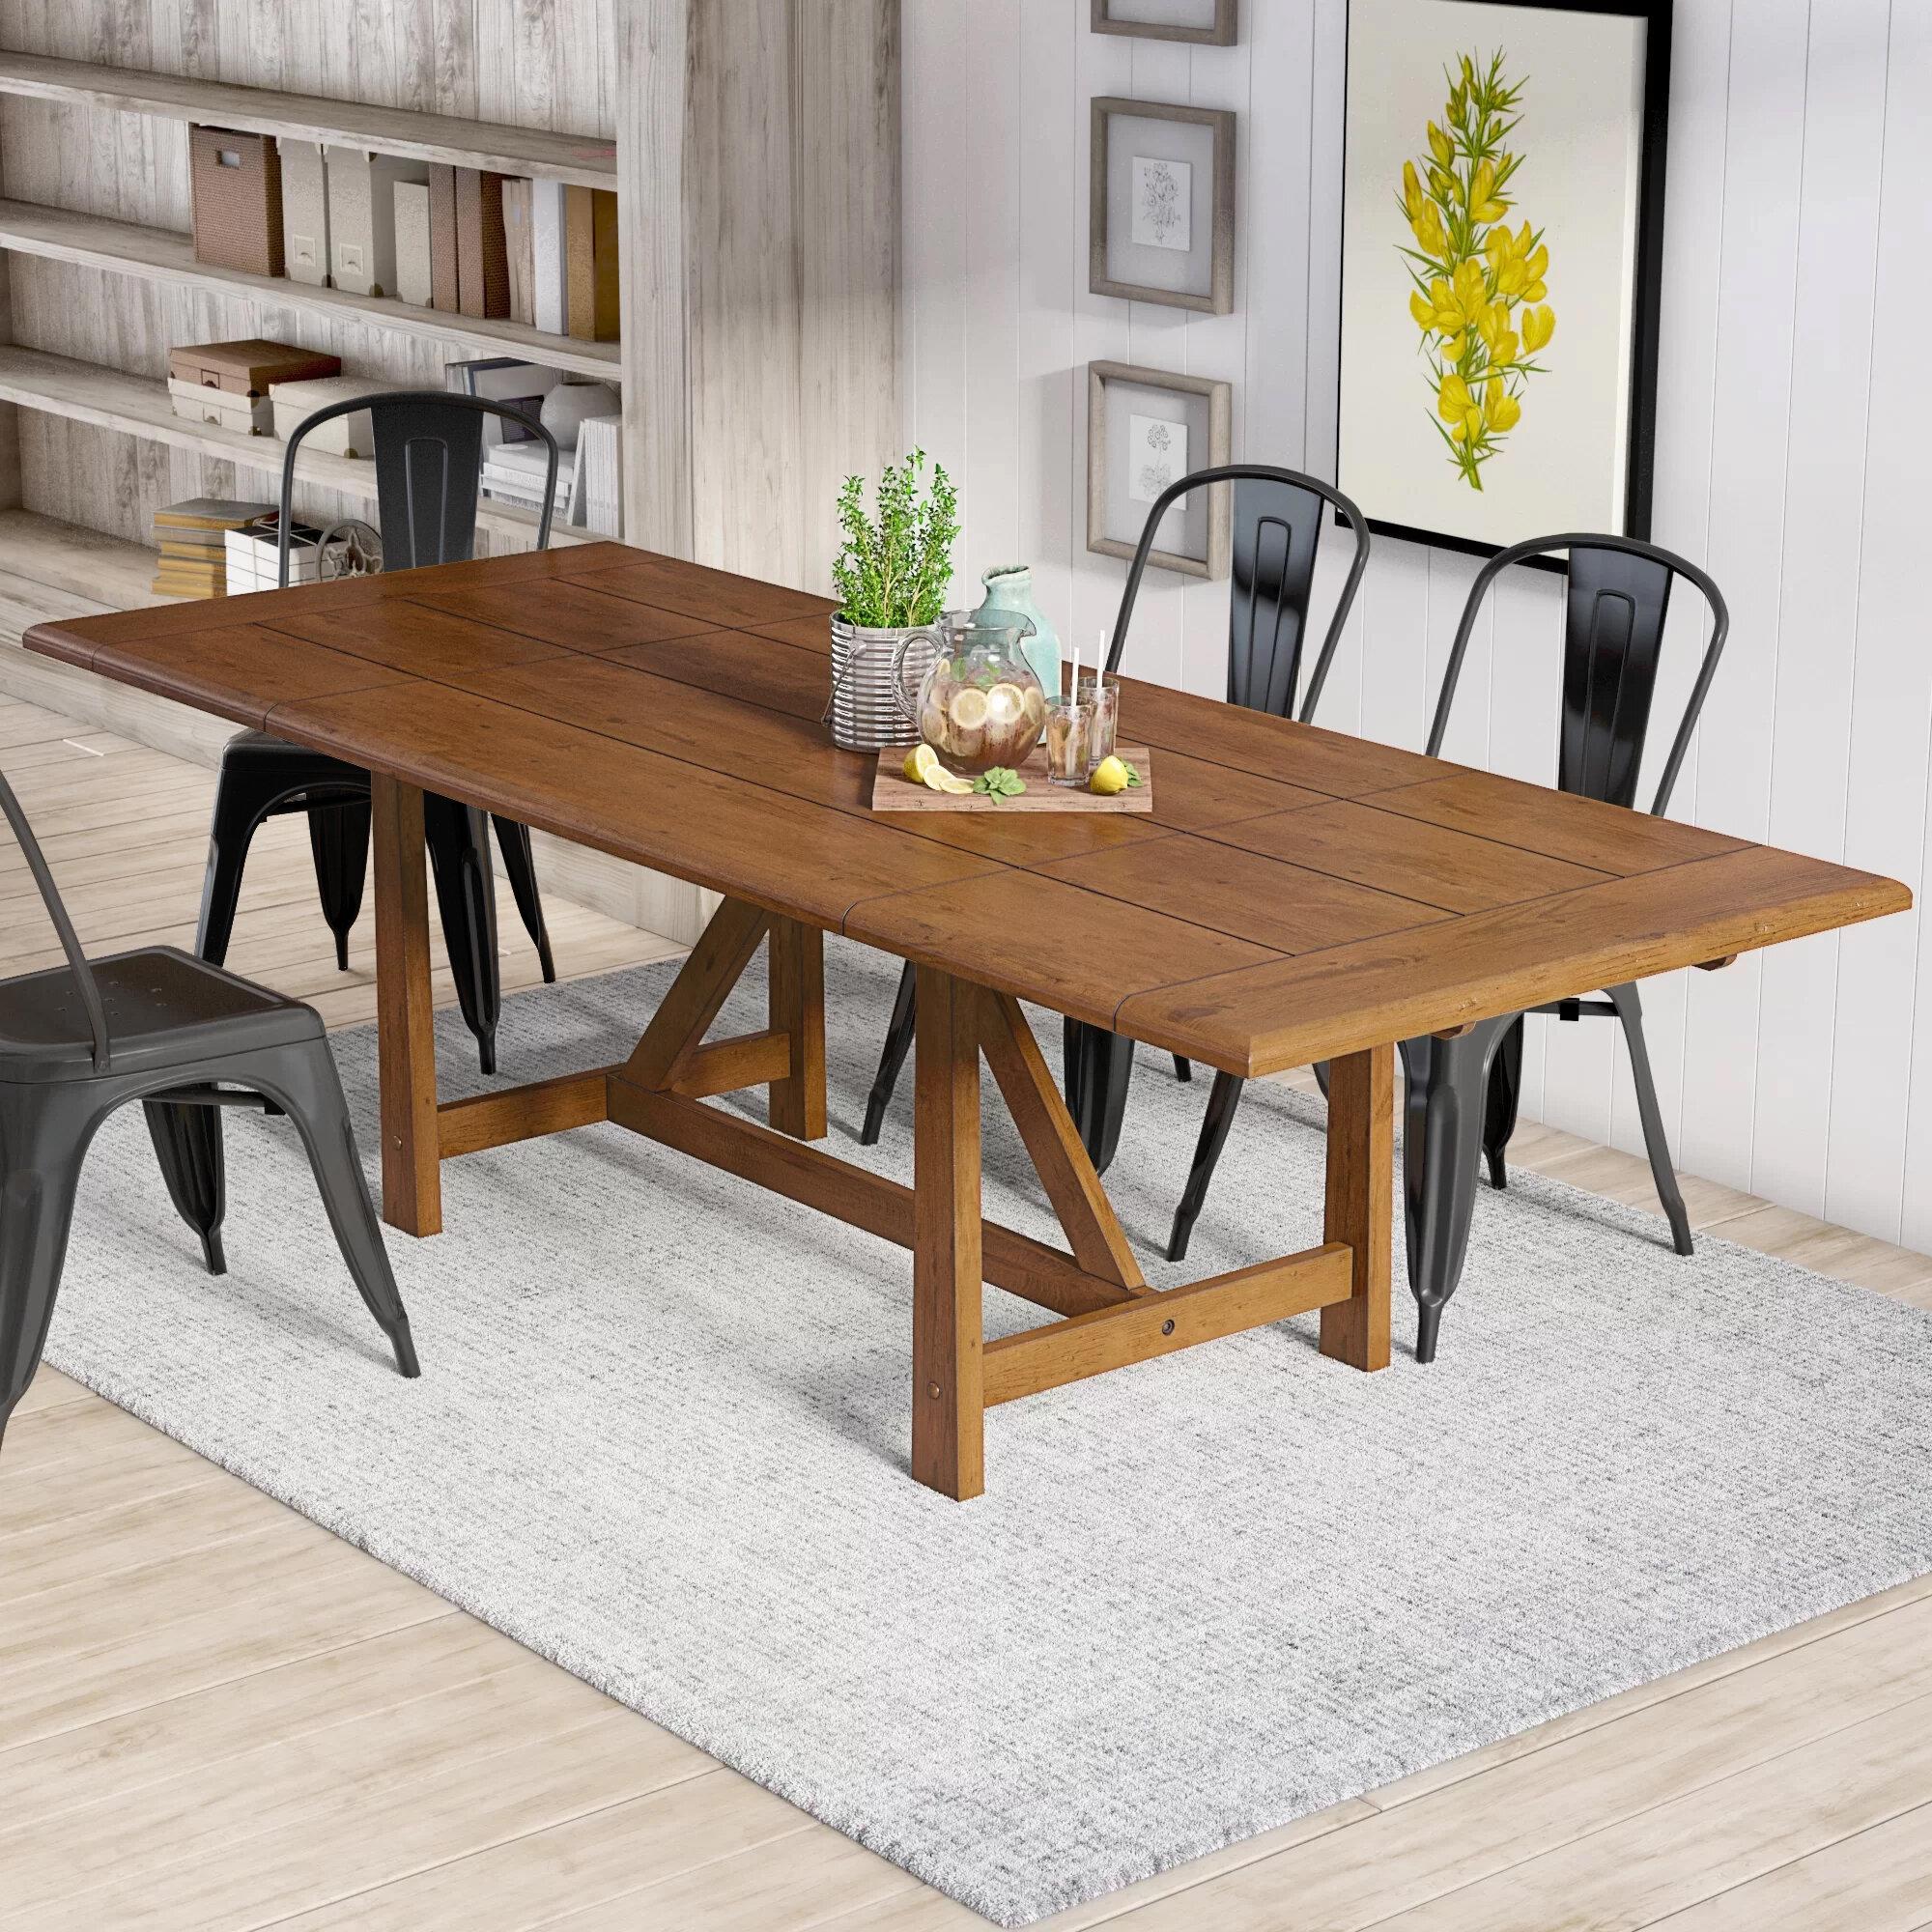 August Grove Clarissa Extendable Dining Table Reviews Wayfair